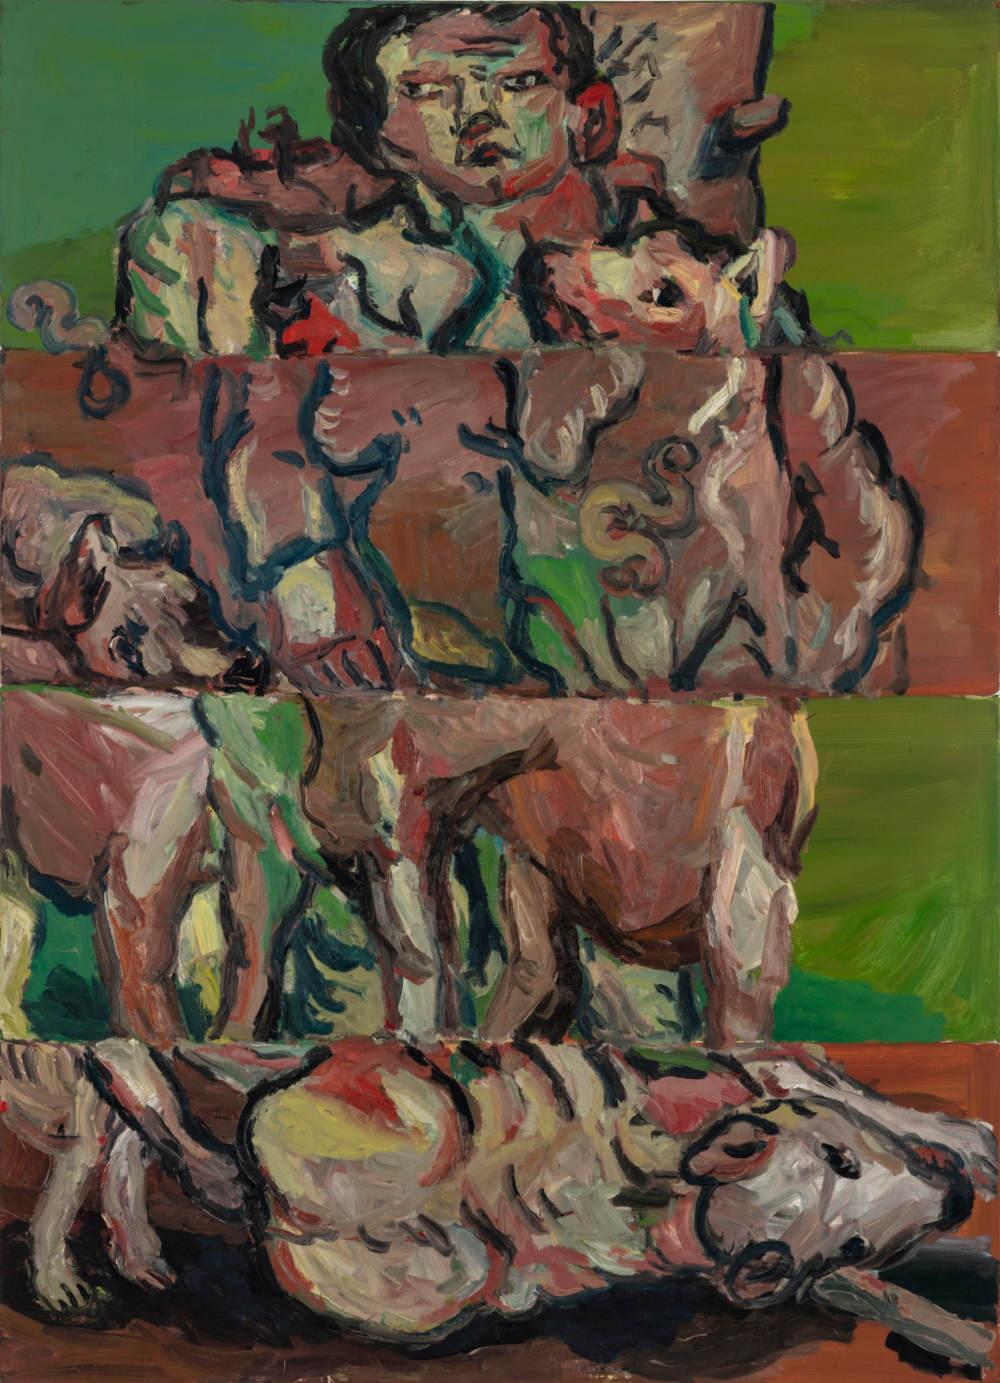 Georg Baselitz, Der Jäger (The Hunter), 1966. Oil on canvas 71 x 51 1/4 inches 180.3 x 130.2 cm